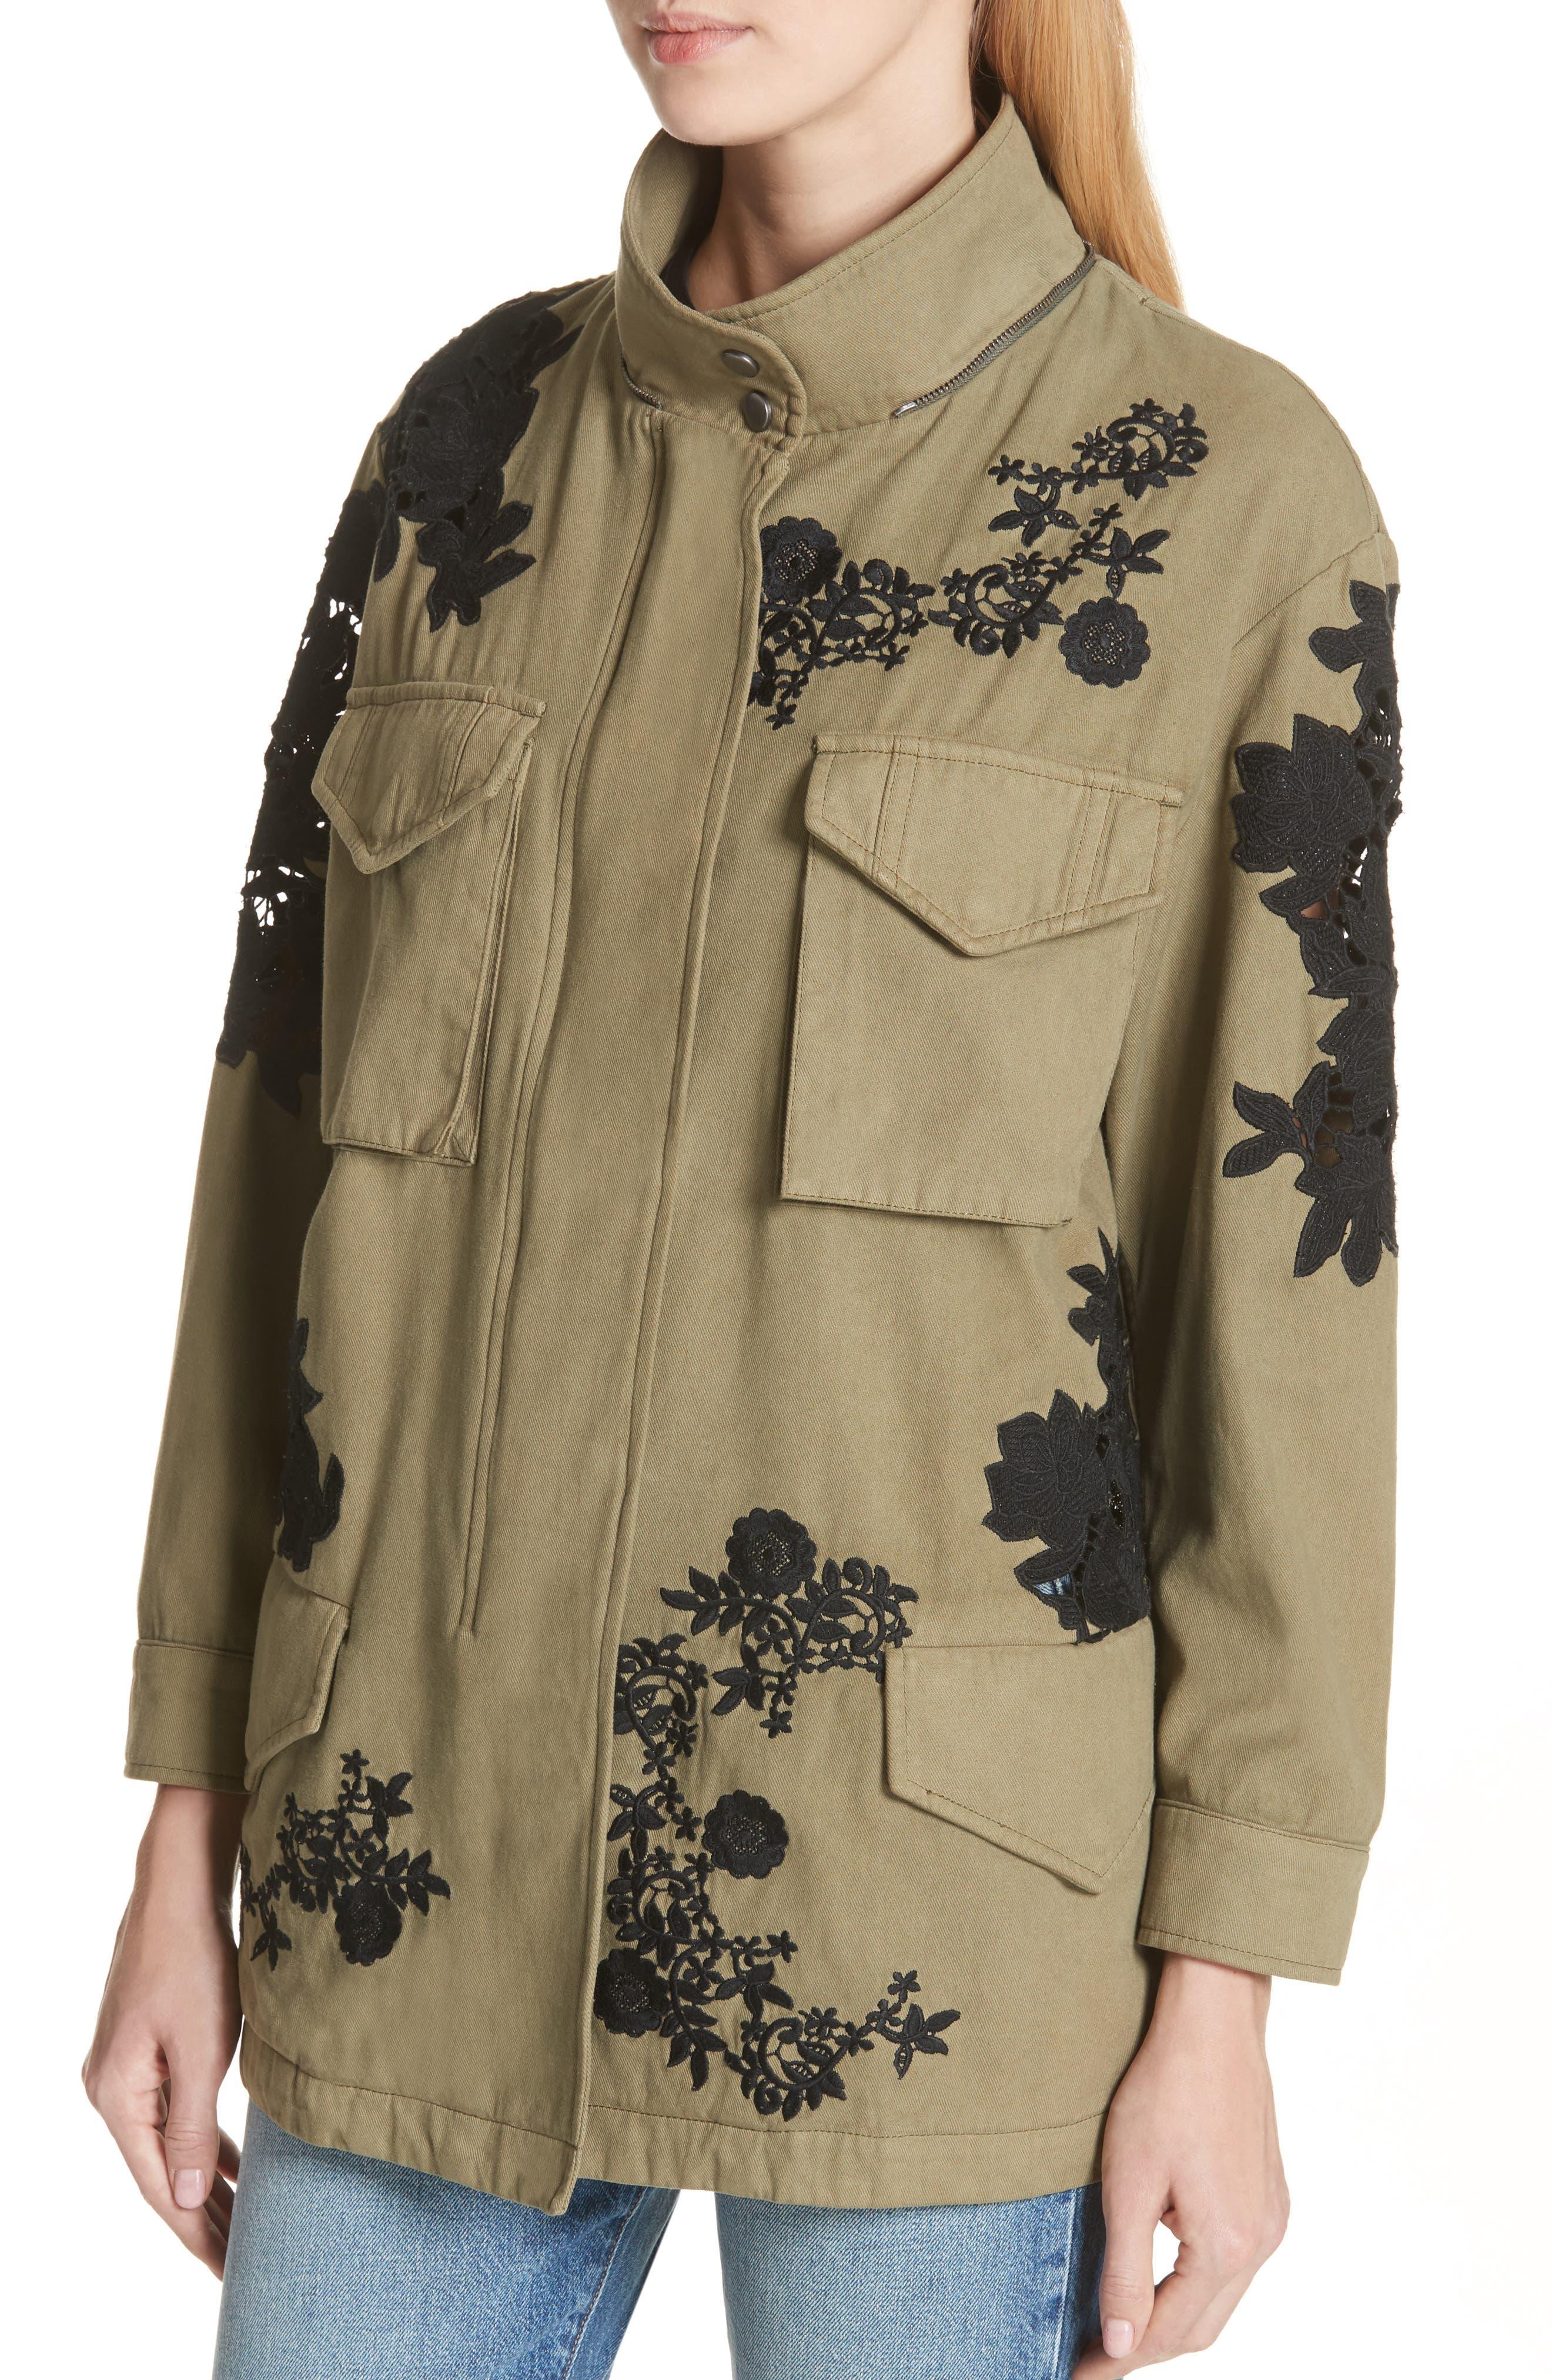 Meta Embroidered Utility Jacket,                             Alternate thumbnail 4, color,                             Olive/ Black